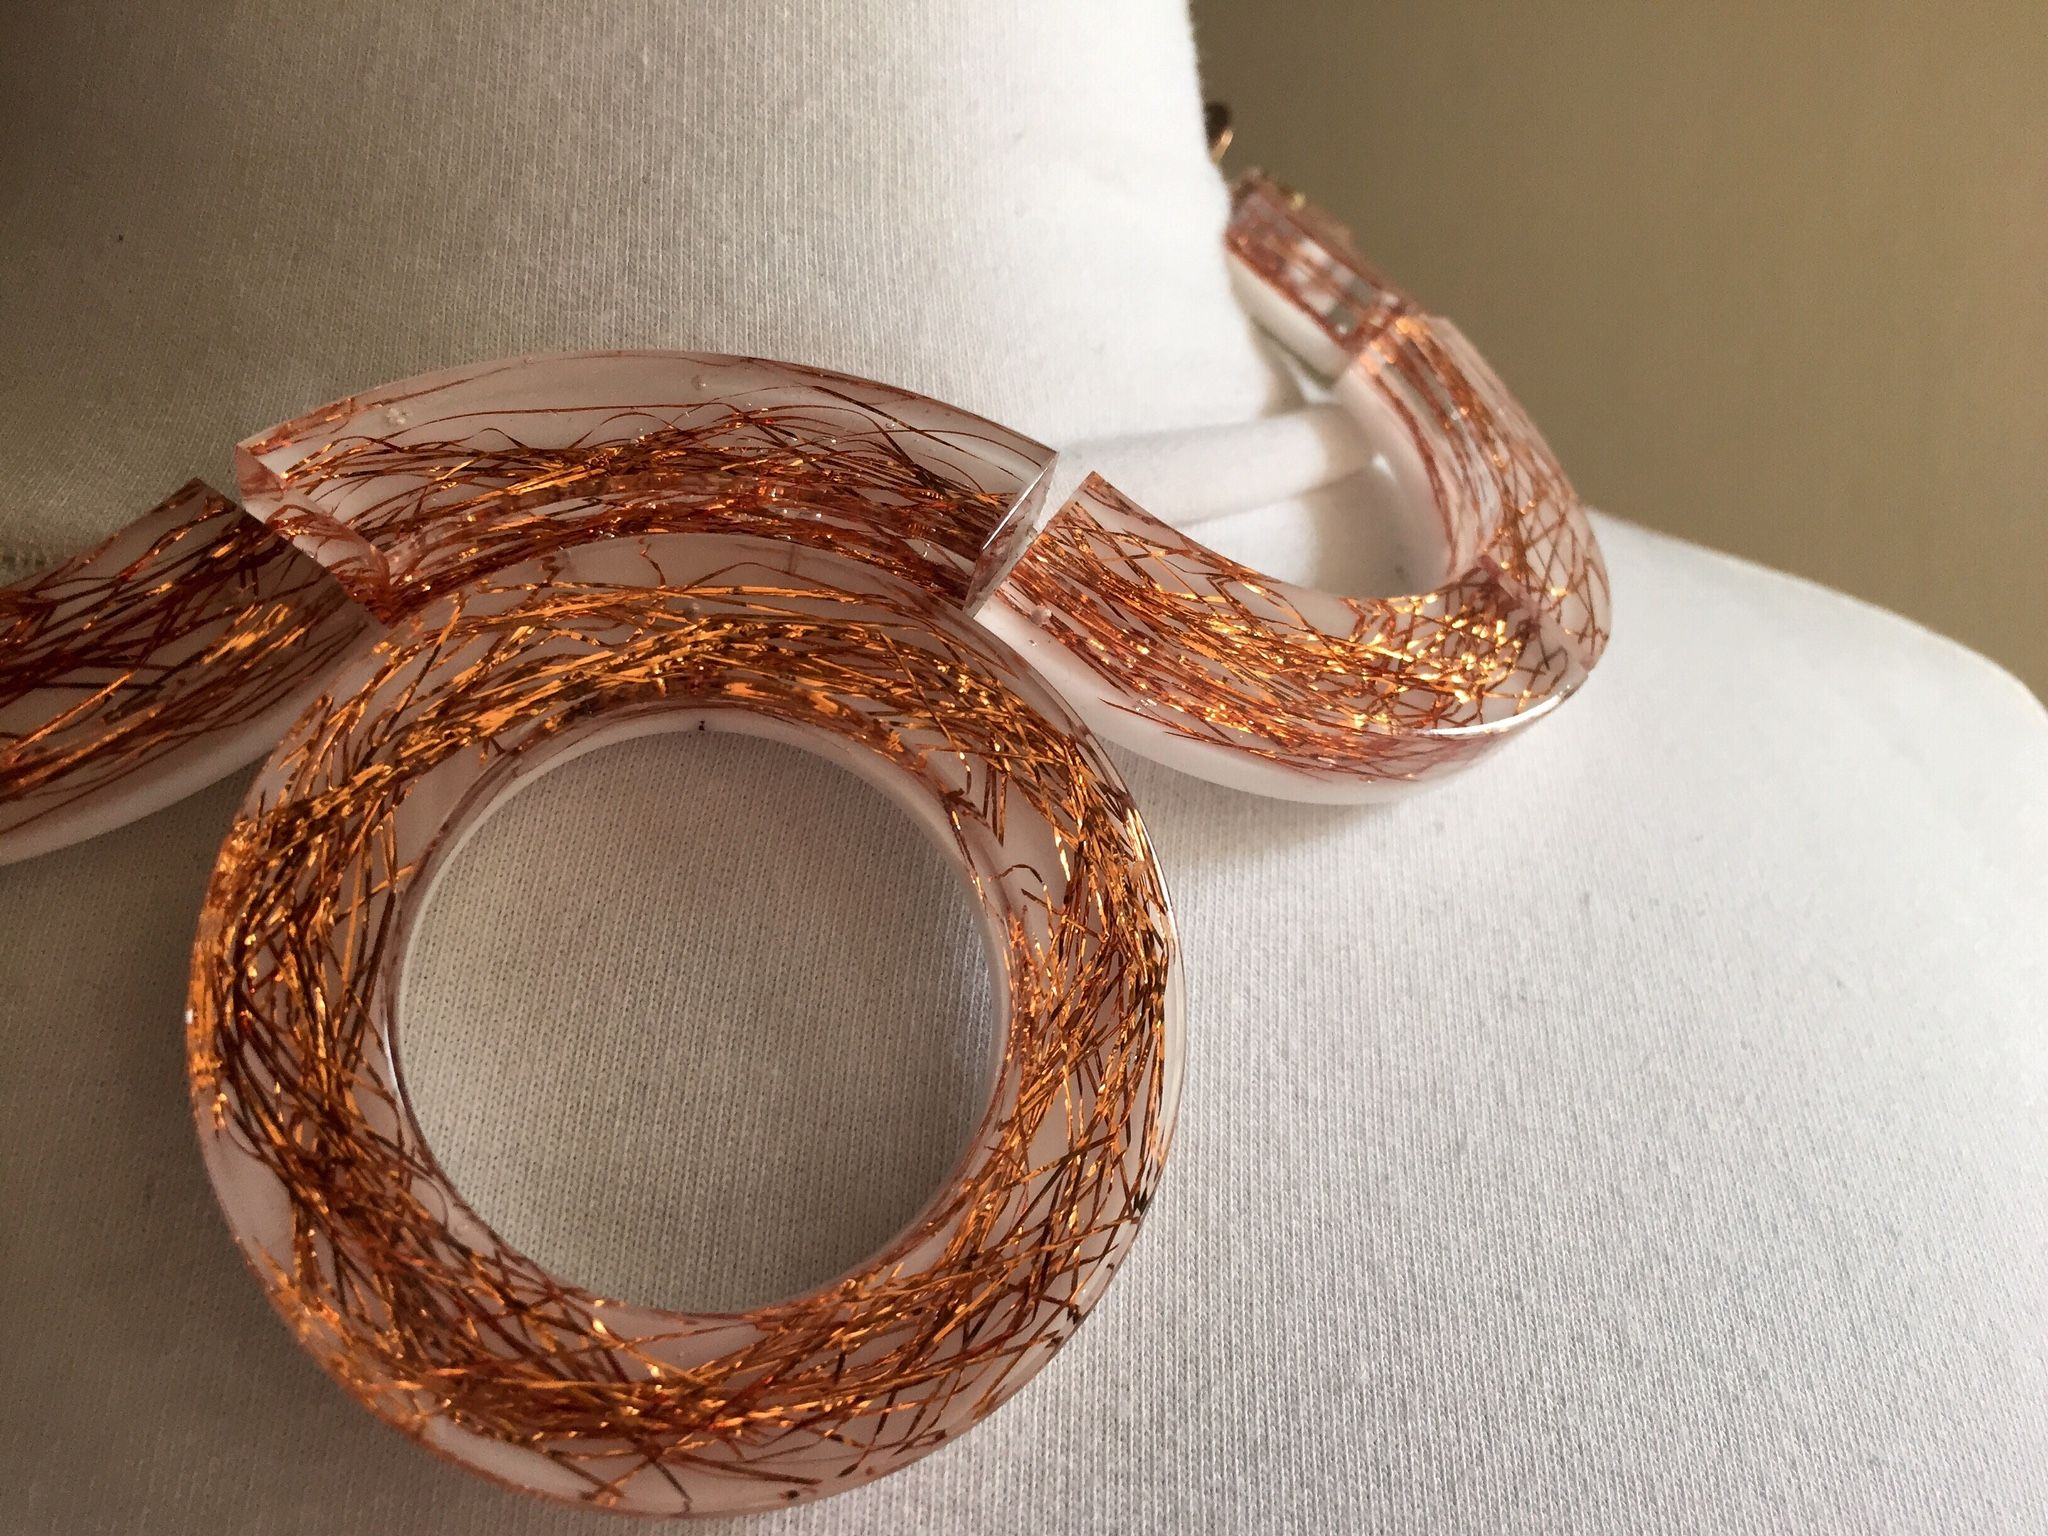 Plexiglas necklace inspired from Greek amphora.